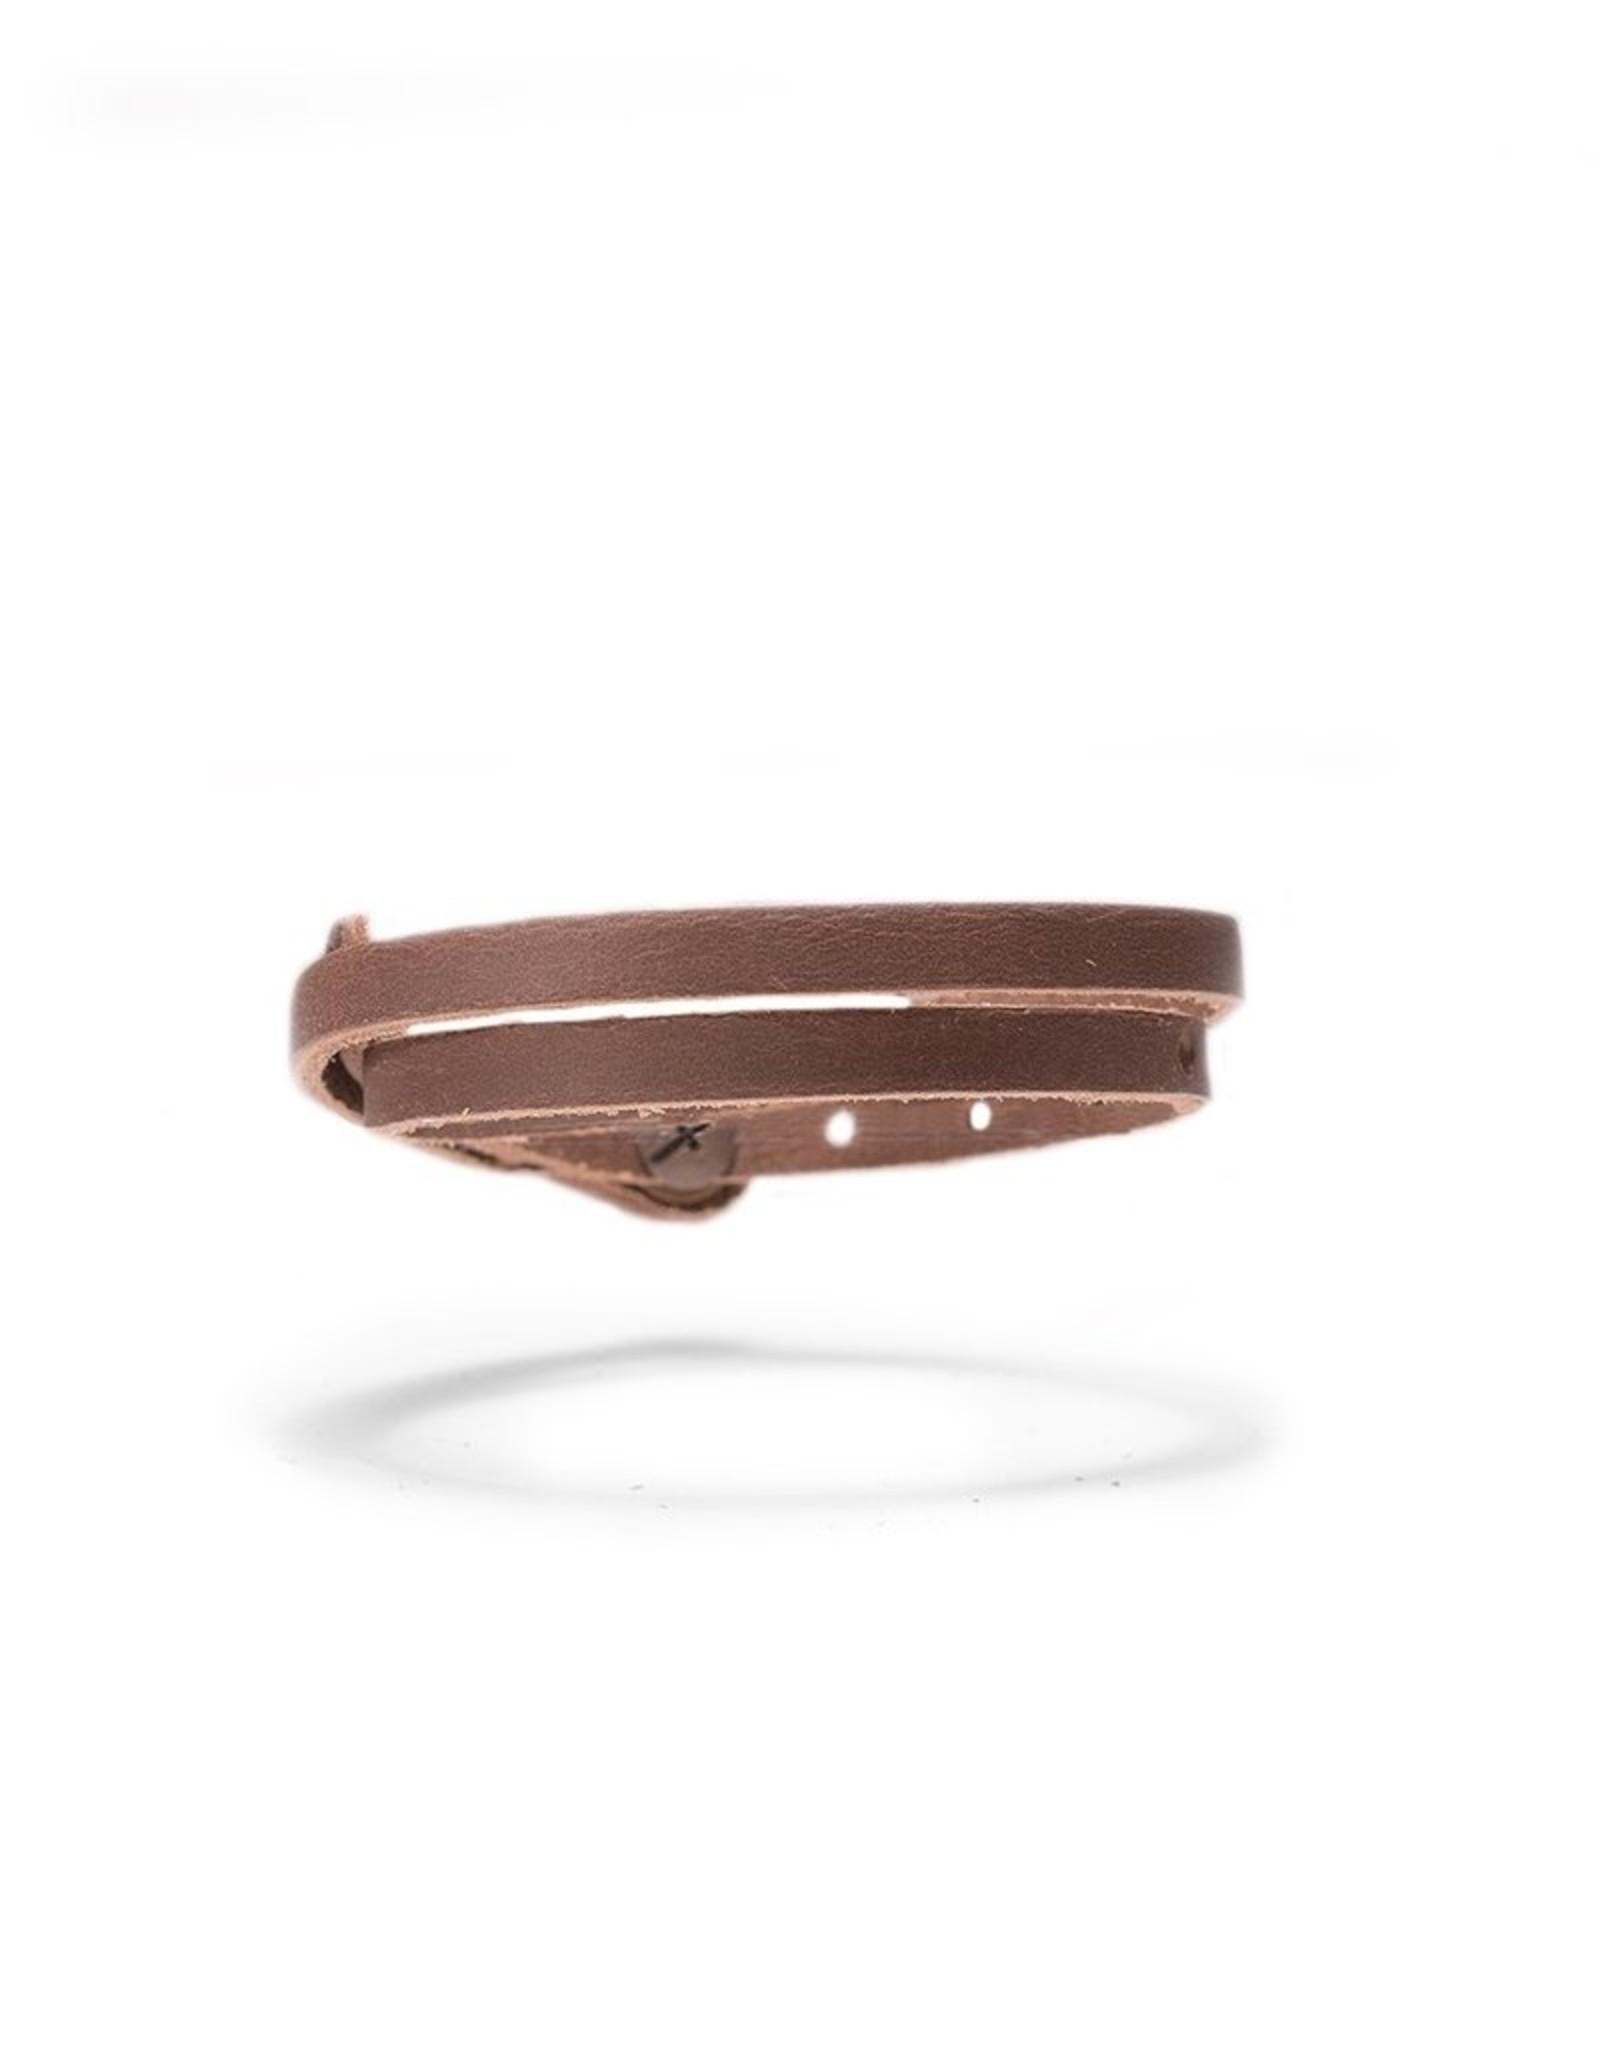 Rustico Skinny Leather Bracelet by Rustico